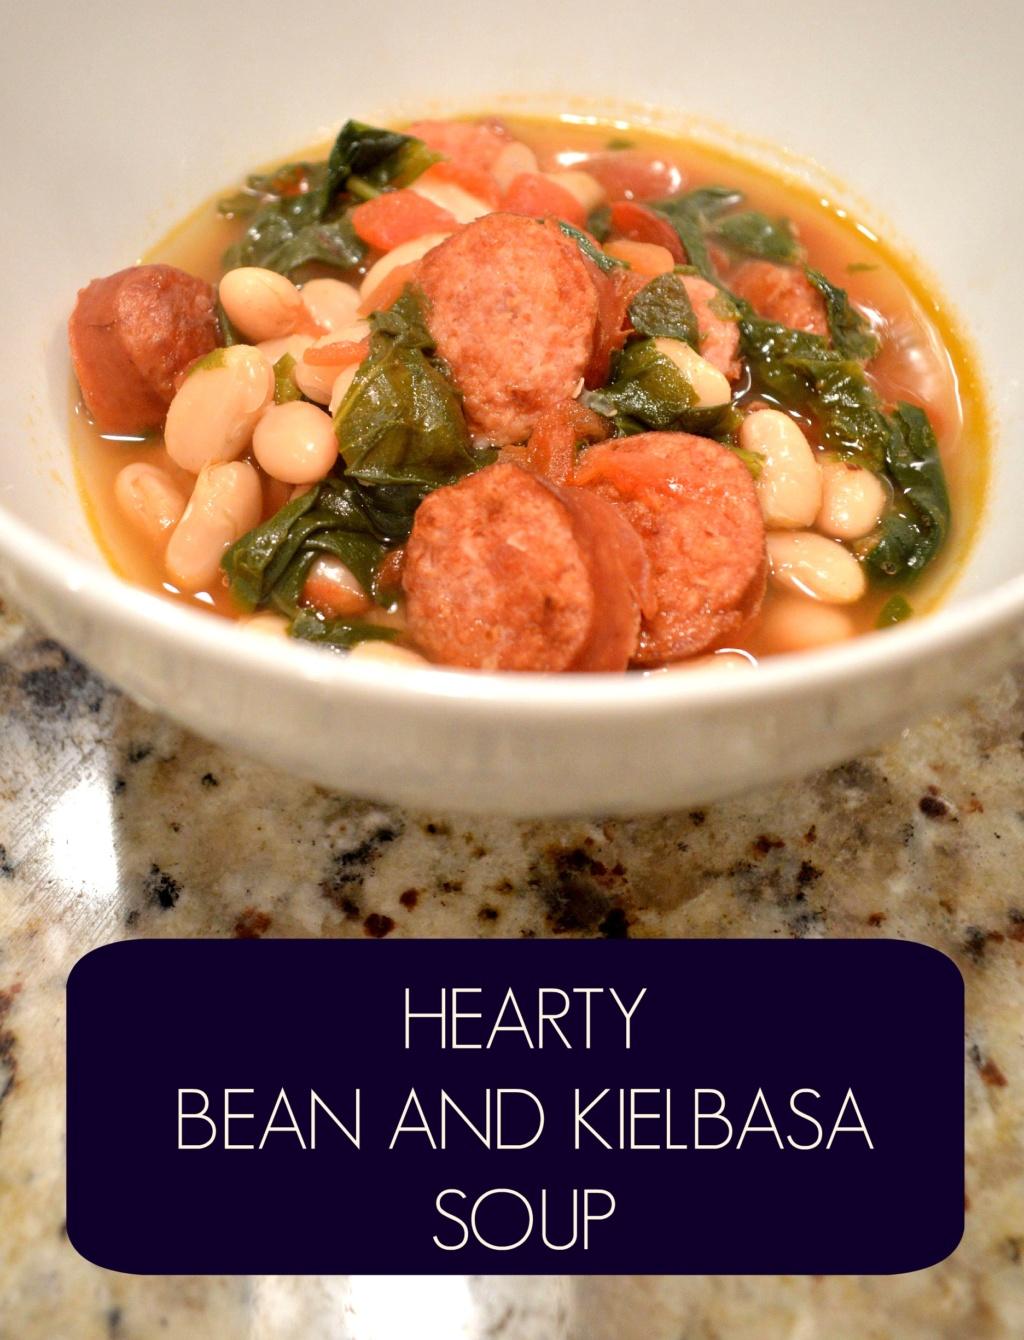 Hearty Bean and Kielbasa Soup